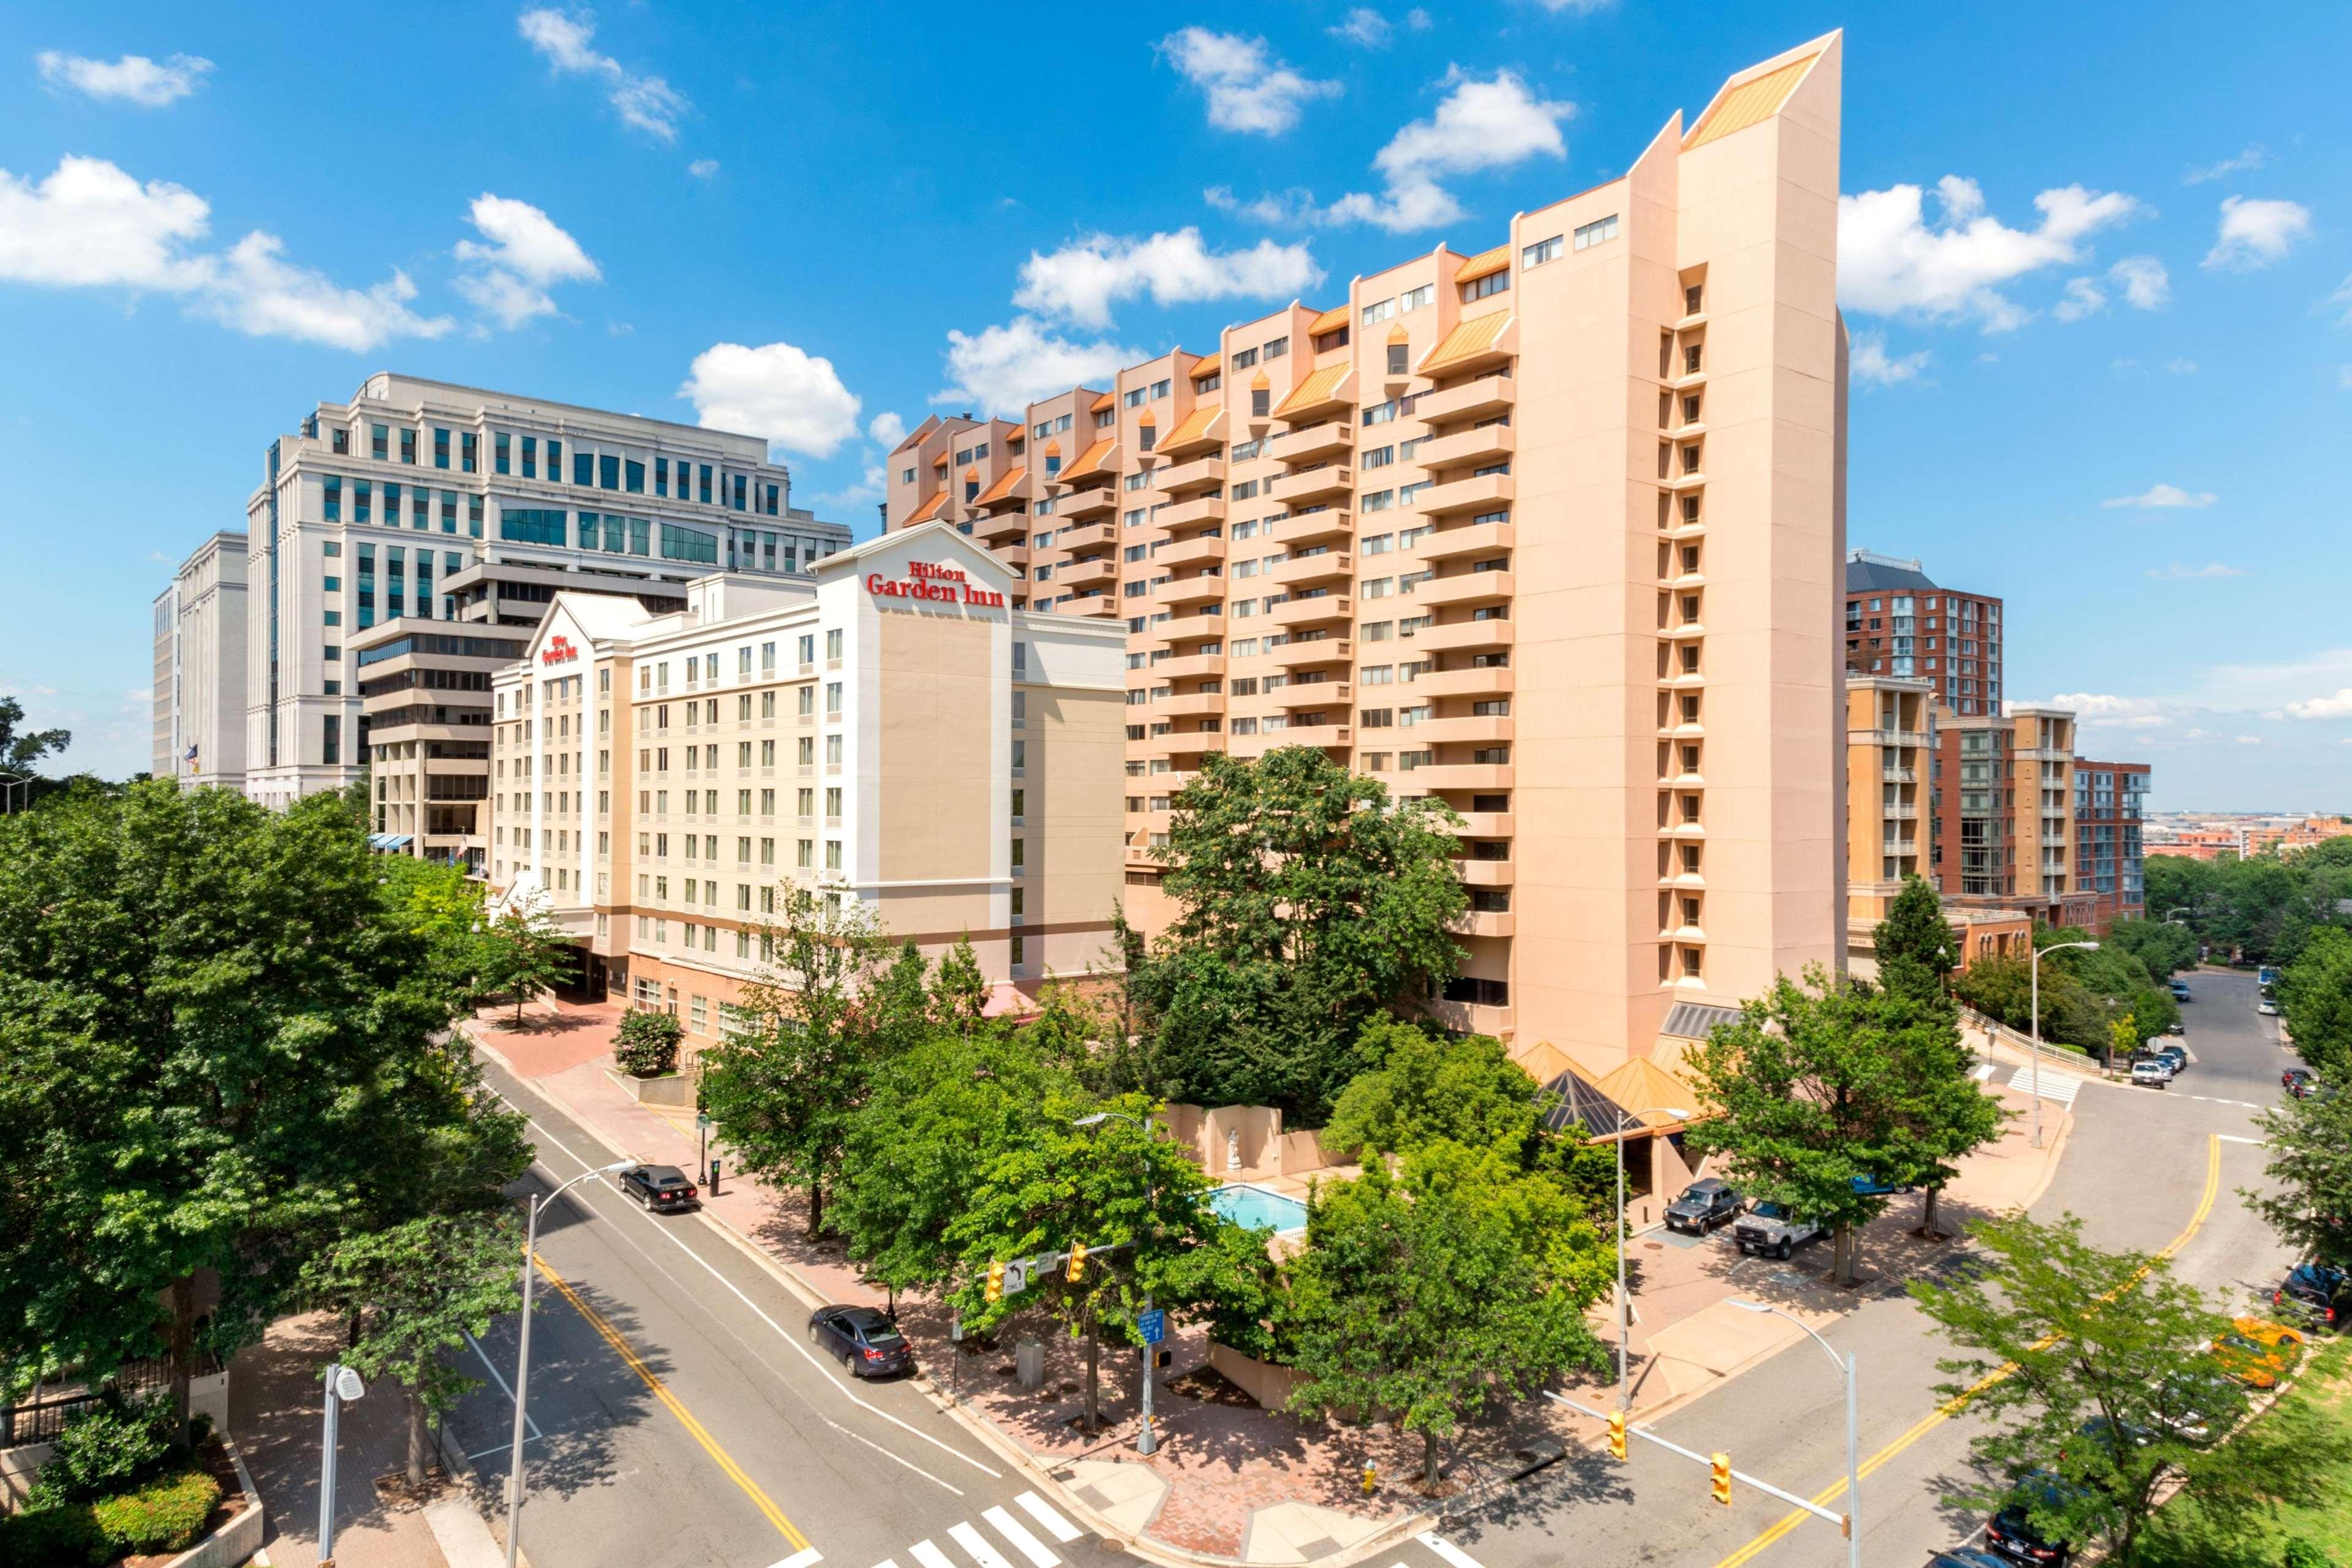 Hilton Garden Inn Arlington/Courthouse Plaza image 11